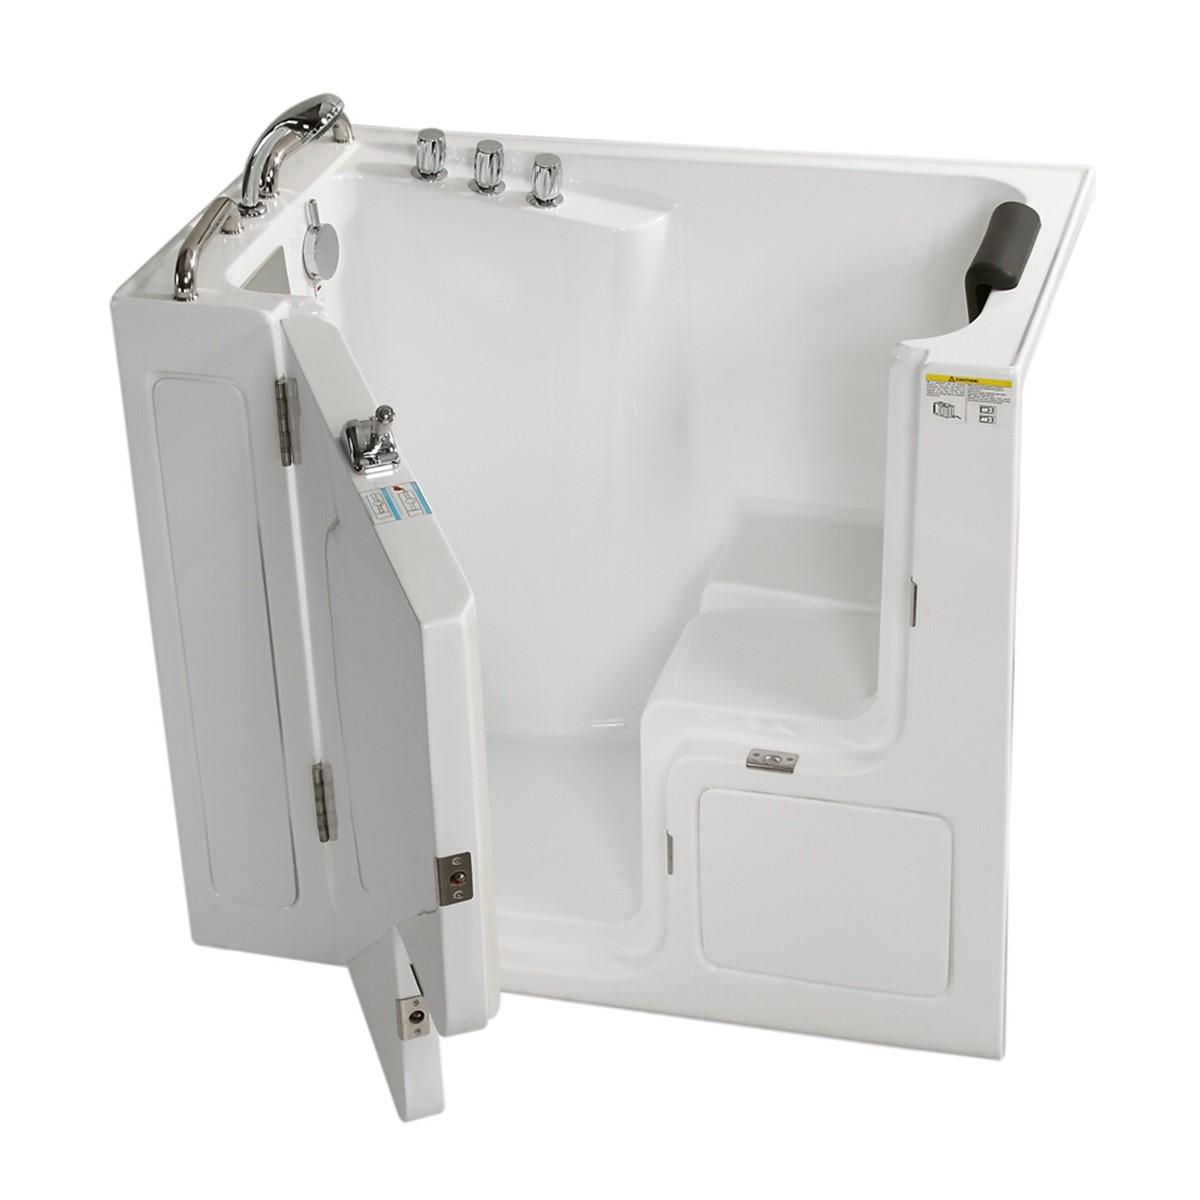 52 x 30 In Walk-in Soaking Bathtub - Acrylic White with Left Drain (DK-Q358-L)